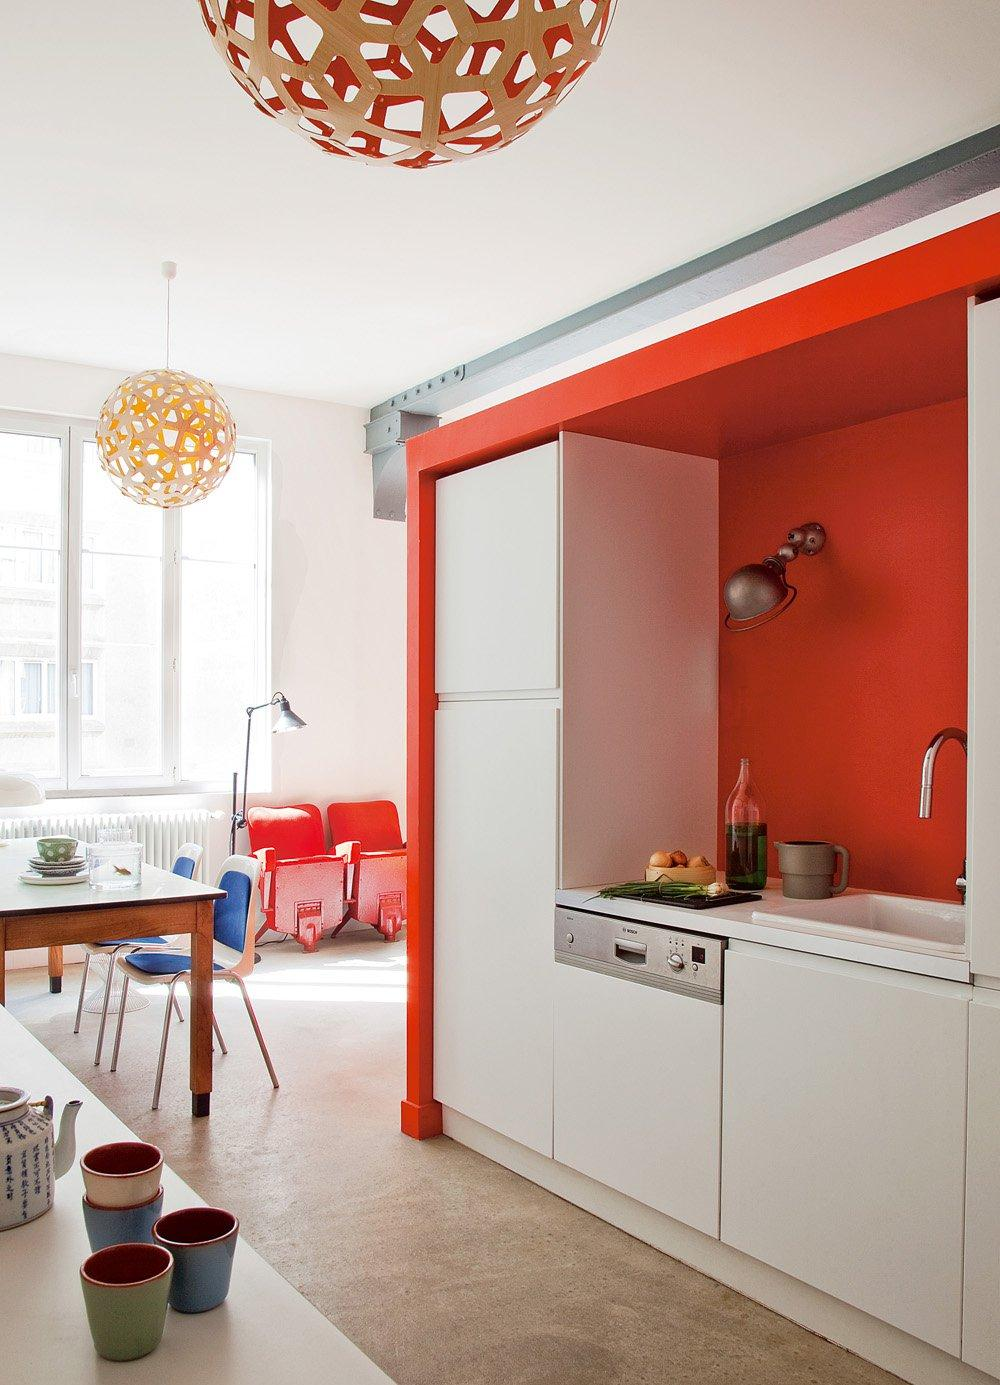 Холодильник в углу на кухне